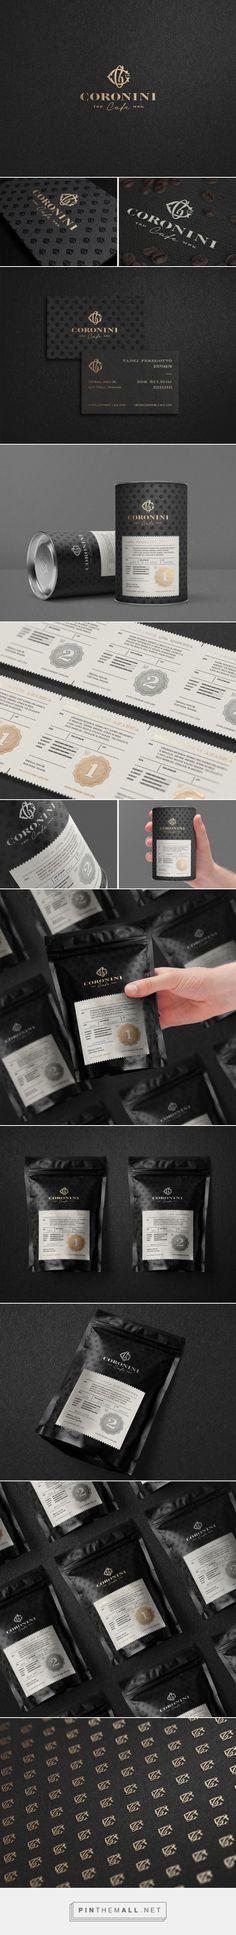 Coronini Cafe Coffee packaging designed by Milovanović (Slovenia) - http://www.packagingoftheworld.com/2016/02/coronini-cafe.html